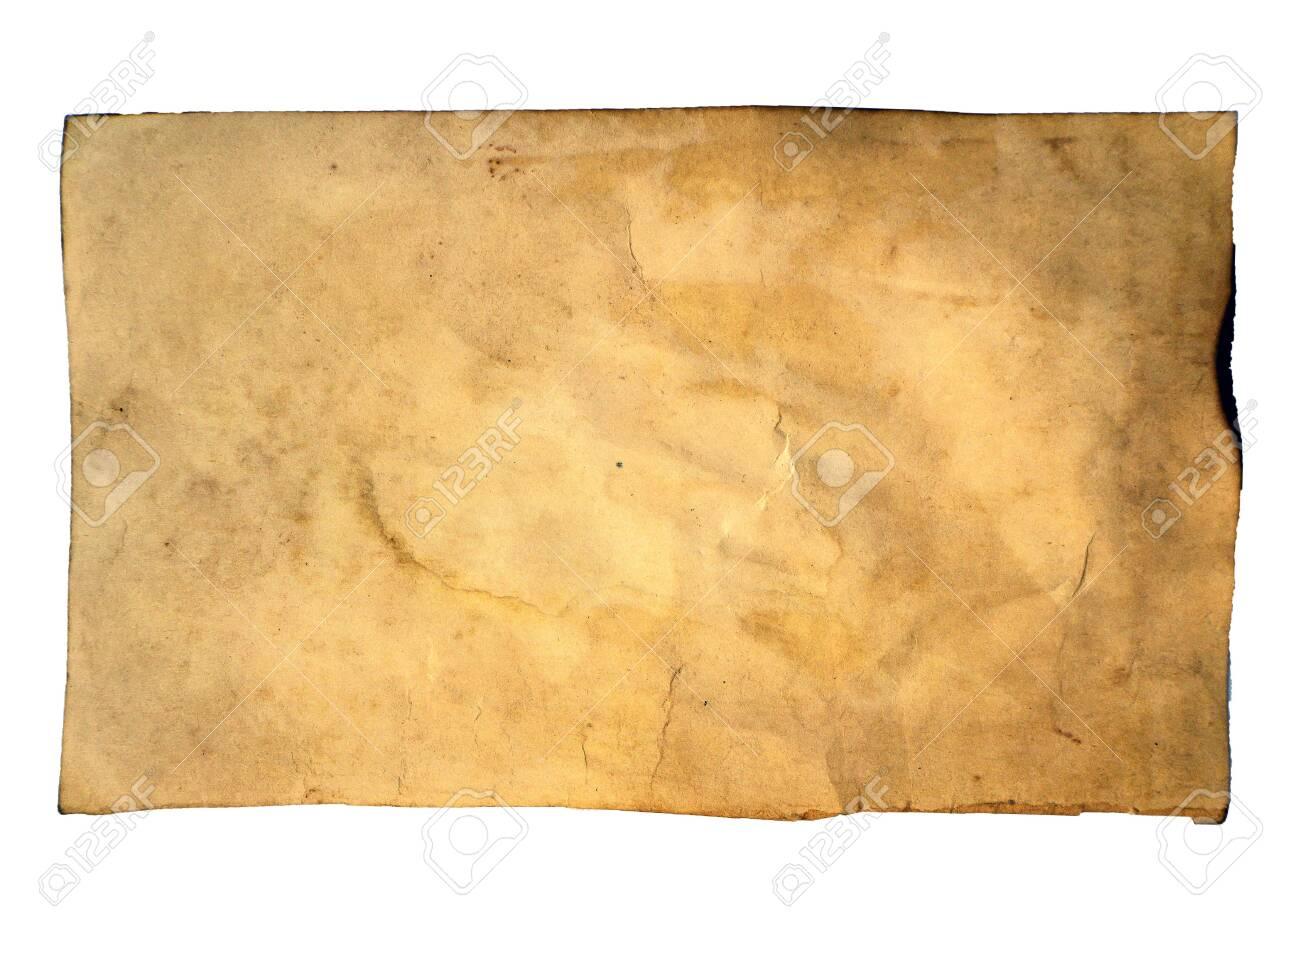 Grunge Crumpled Dirty Beige Paper Sheet Vintage Background Old